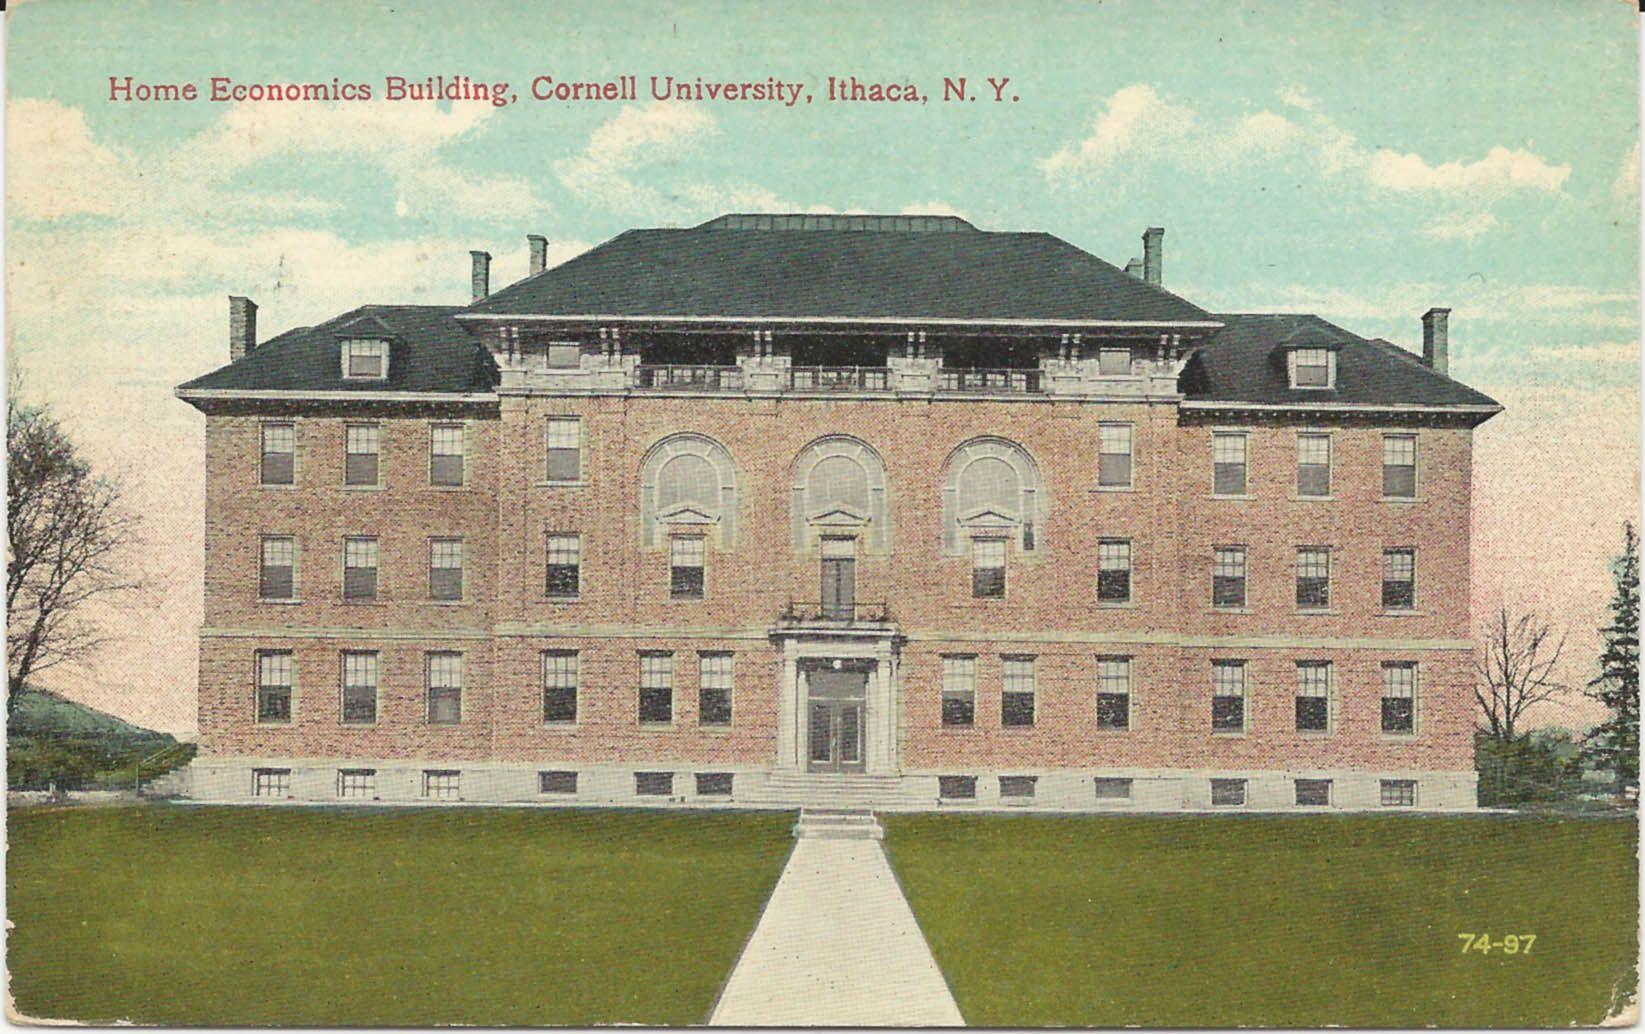 Home economics building, 1912-13. | Collection: Human